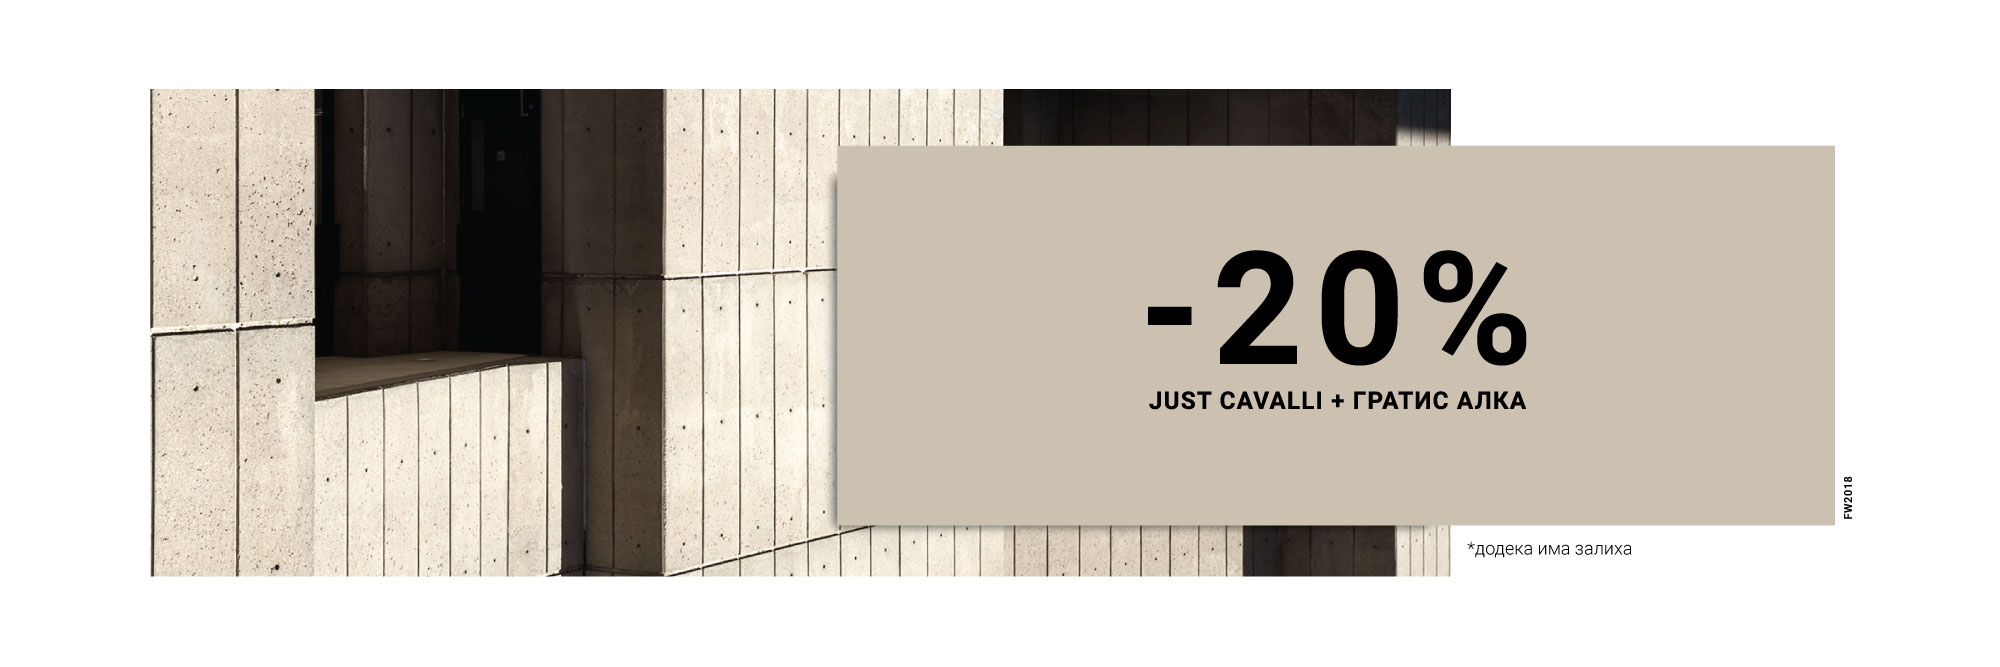 Just Cavalli -20% попуст + гратис алка